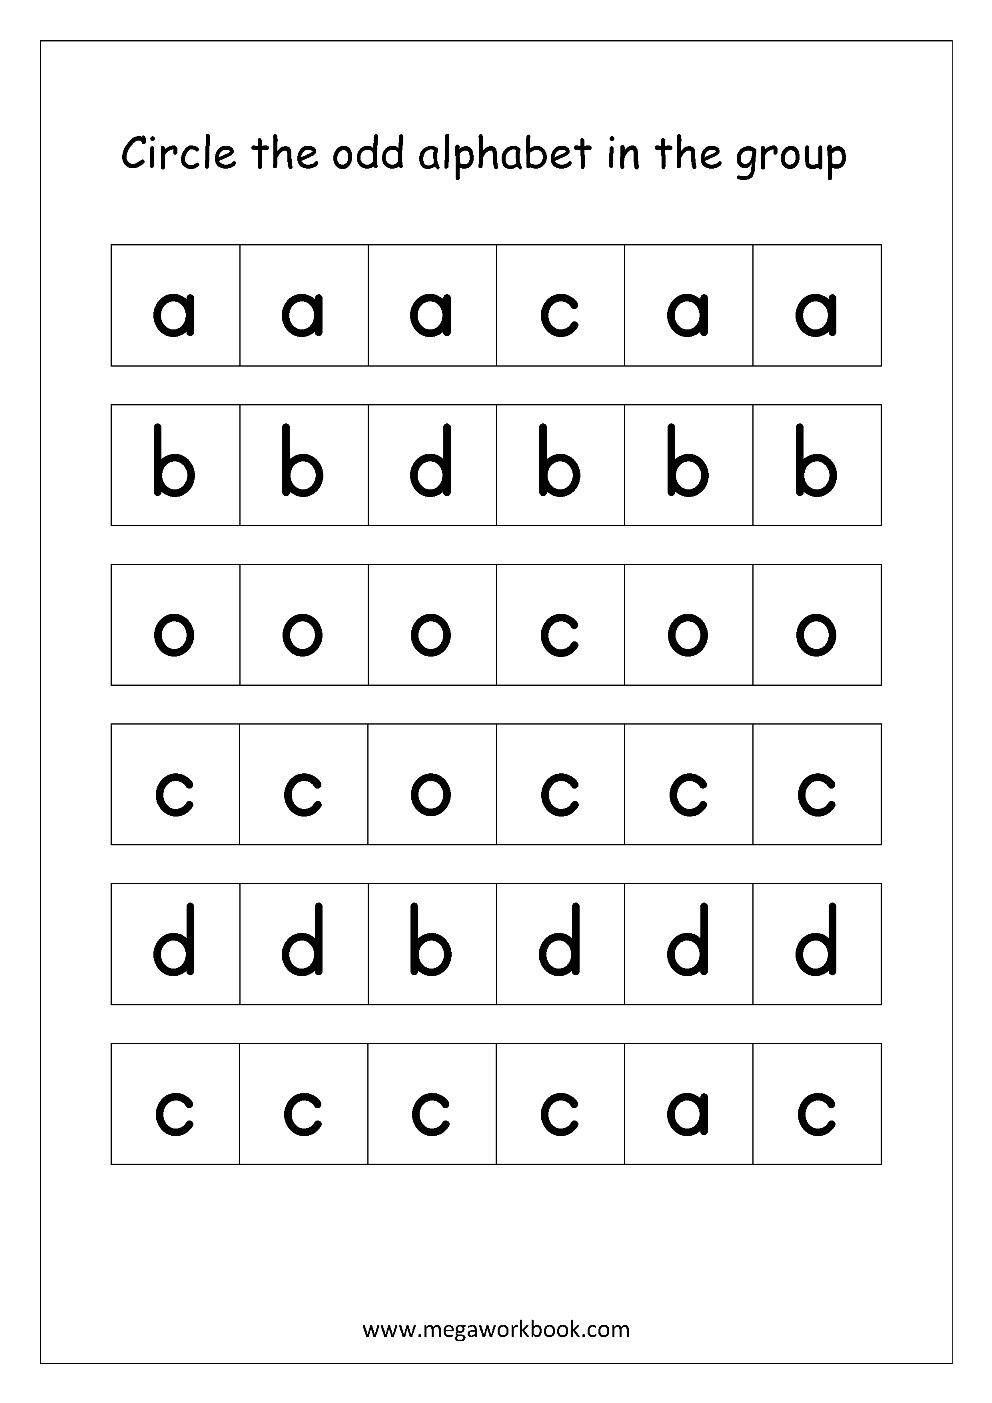 English Worksheets - Confusing Alphabets | English